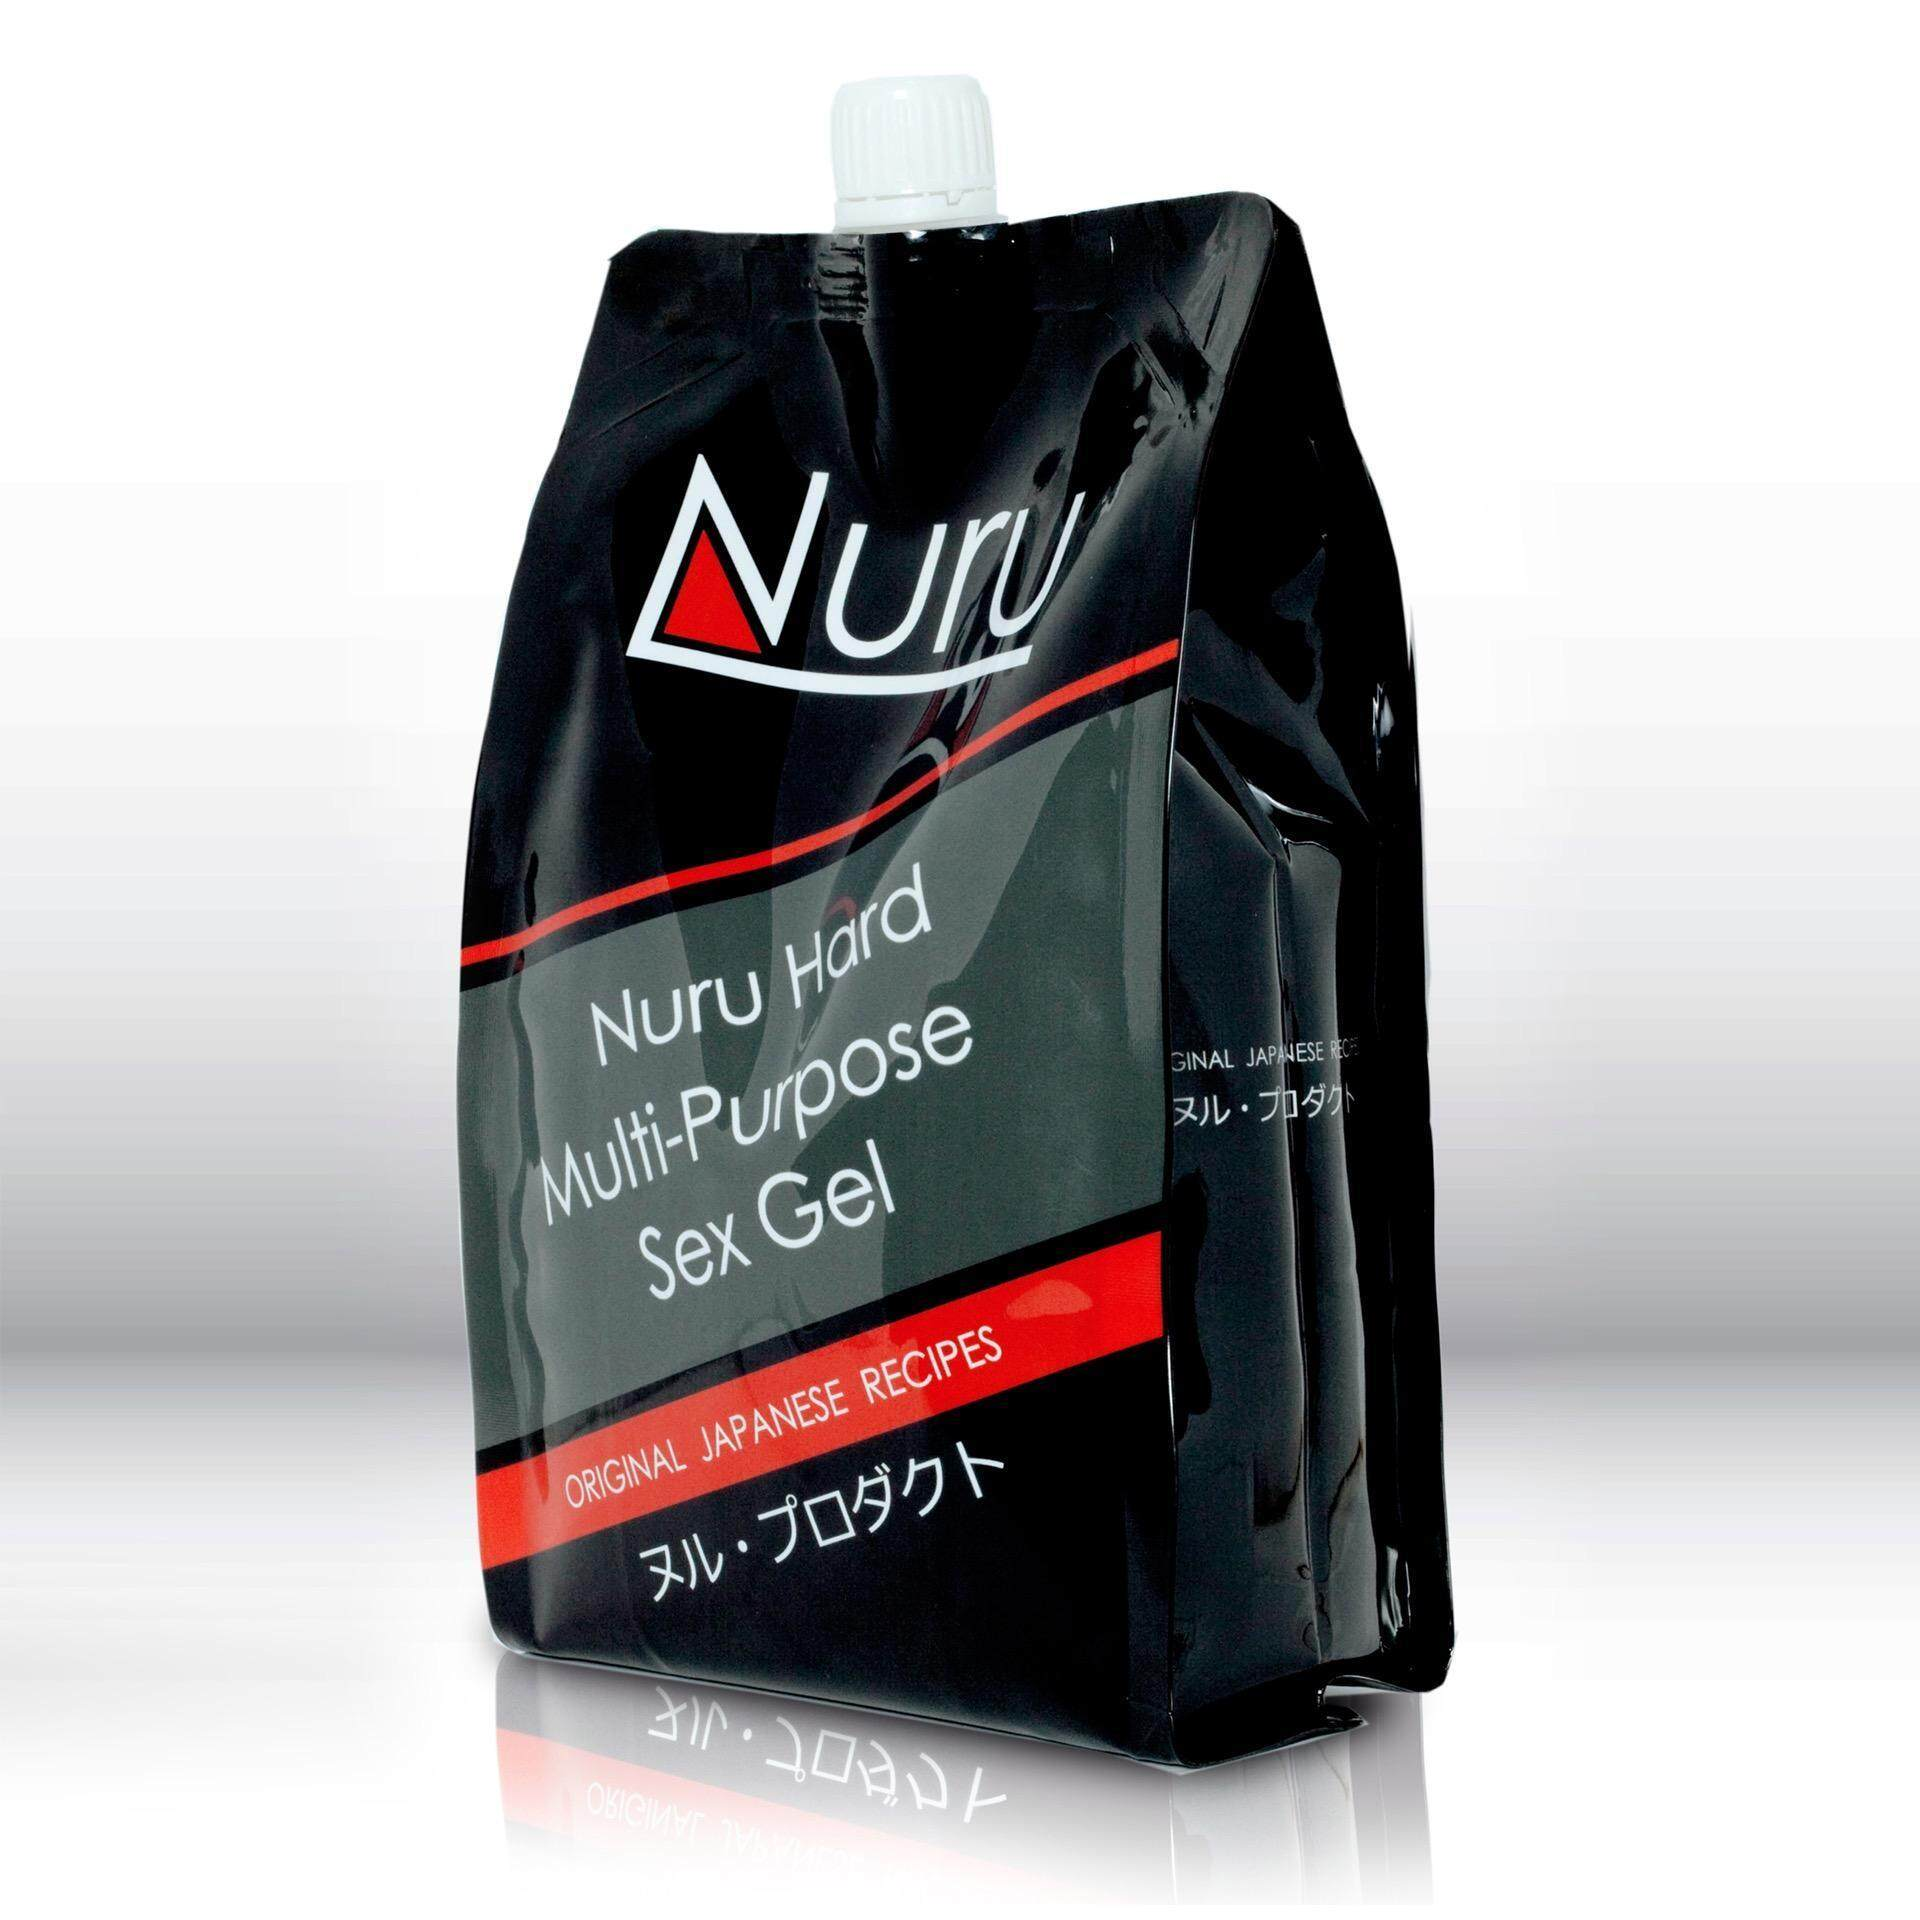 Nuru เจลหล่อลื่น นูรุฮาร์ด1000 มล.